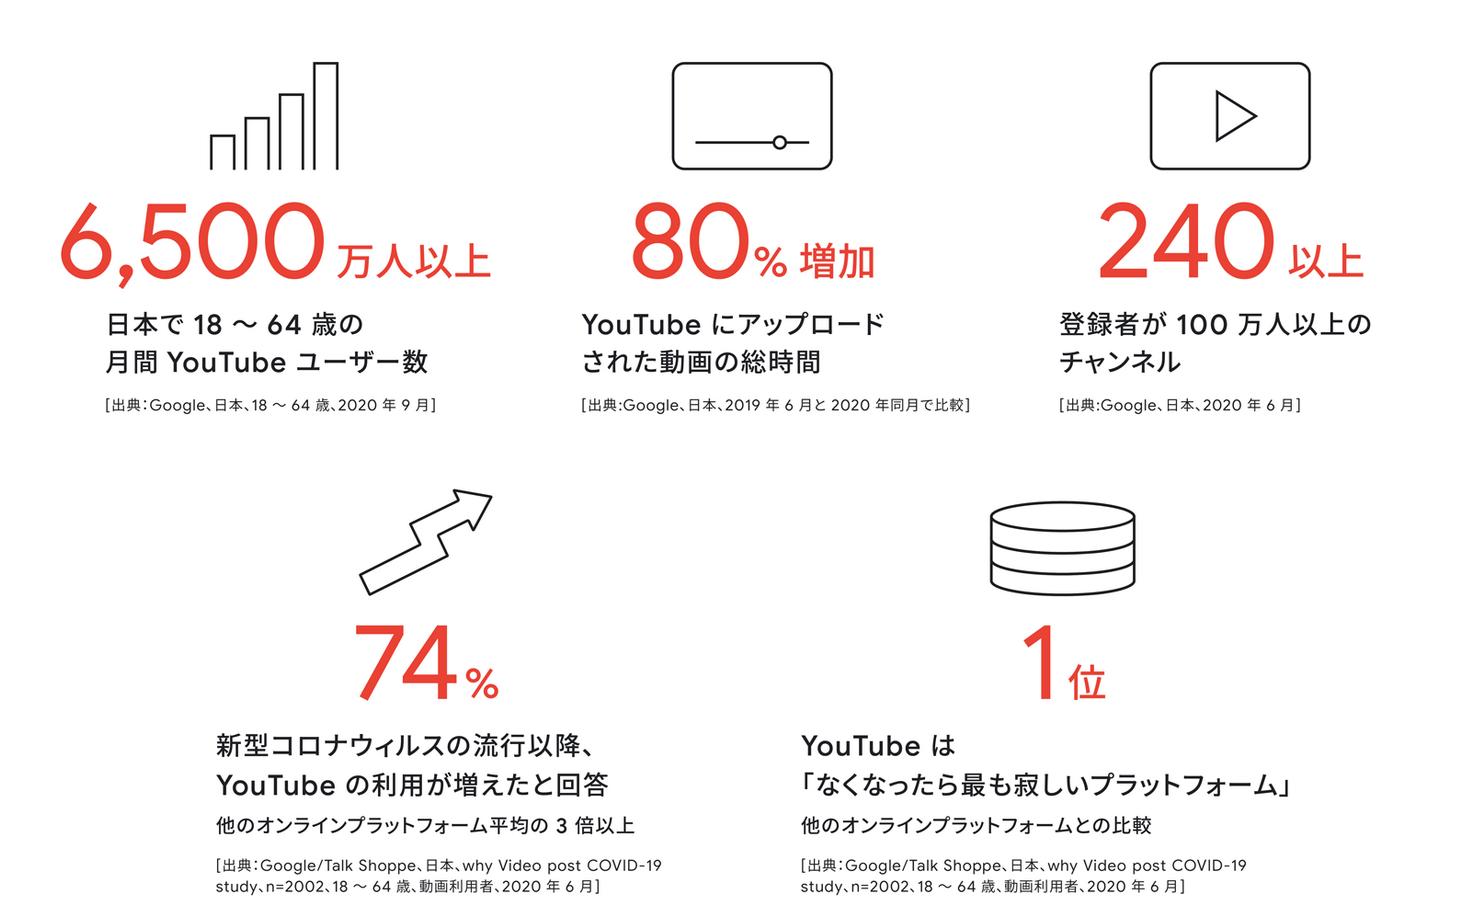 YouTube利用者数